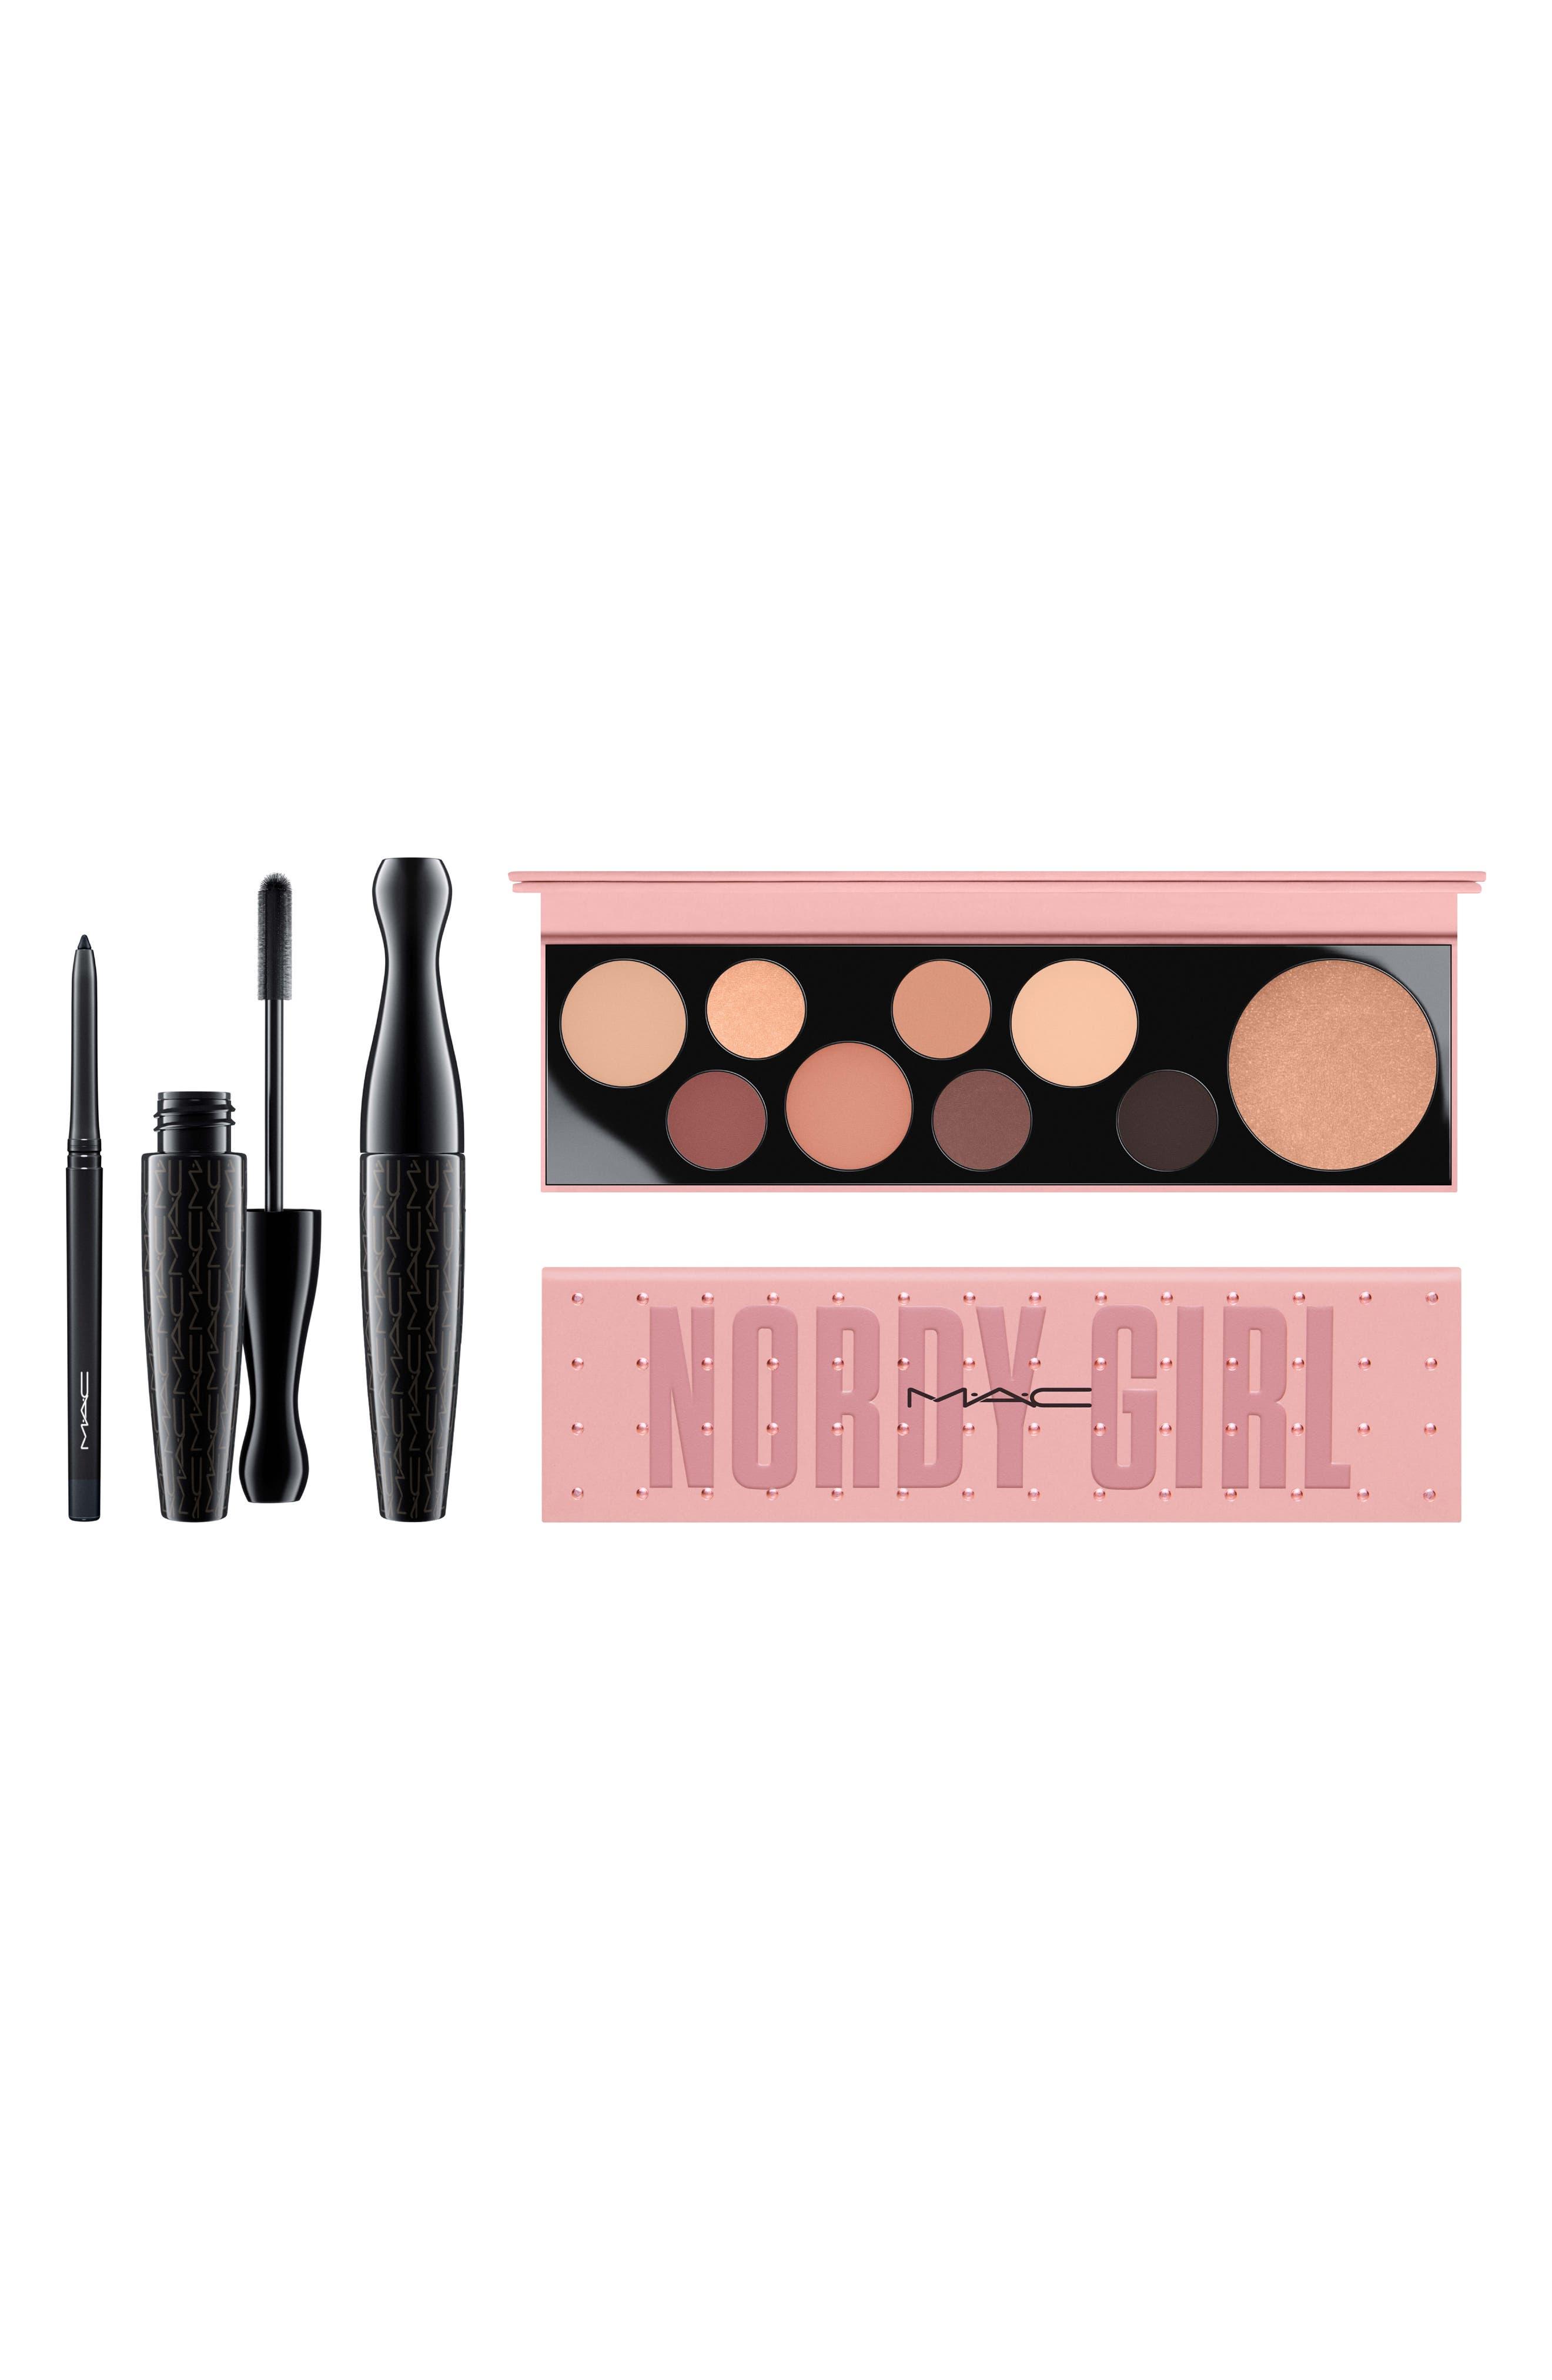 MAC Nordy Girl Matte Face & Eye Set,                             Main thumbnail 1, color,                             000